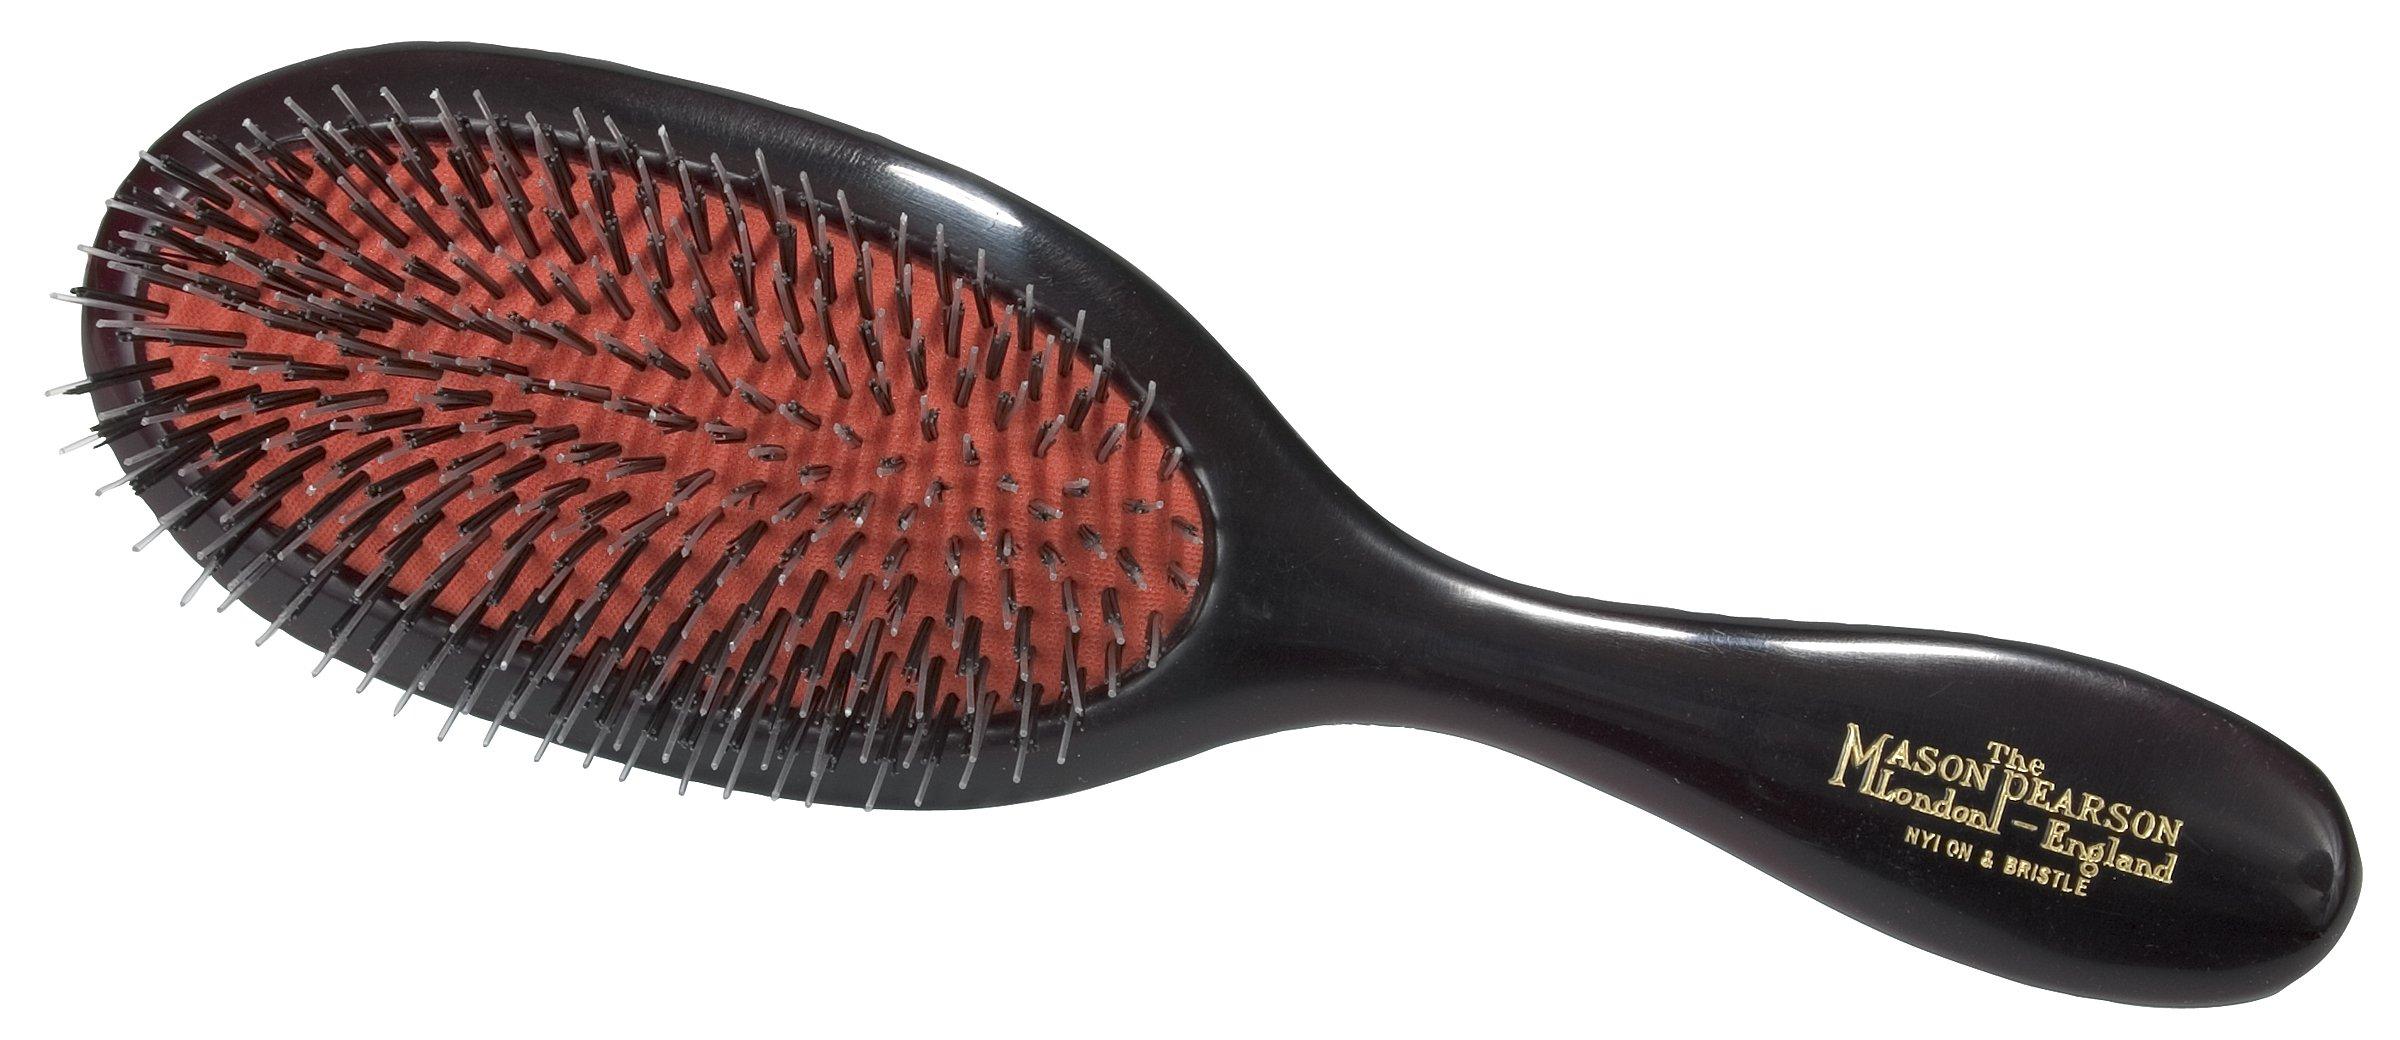 Mason Pearson Handy Mixed Dark Ruby Bristle Brush